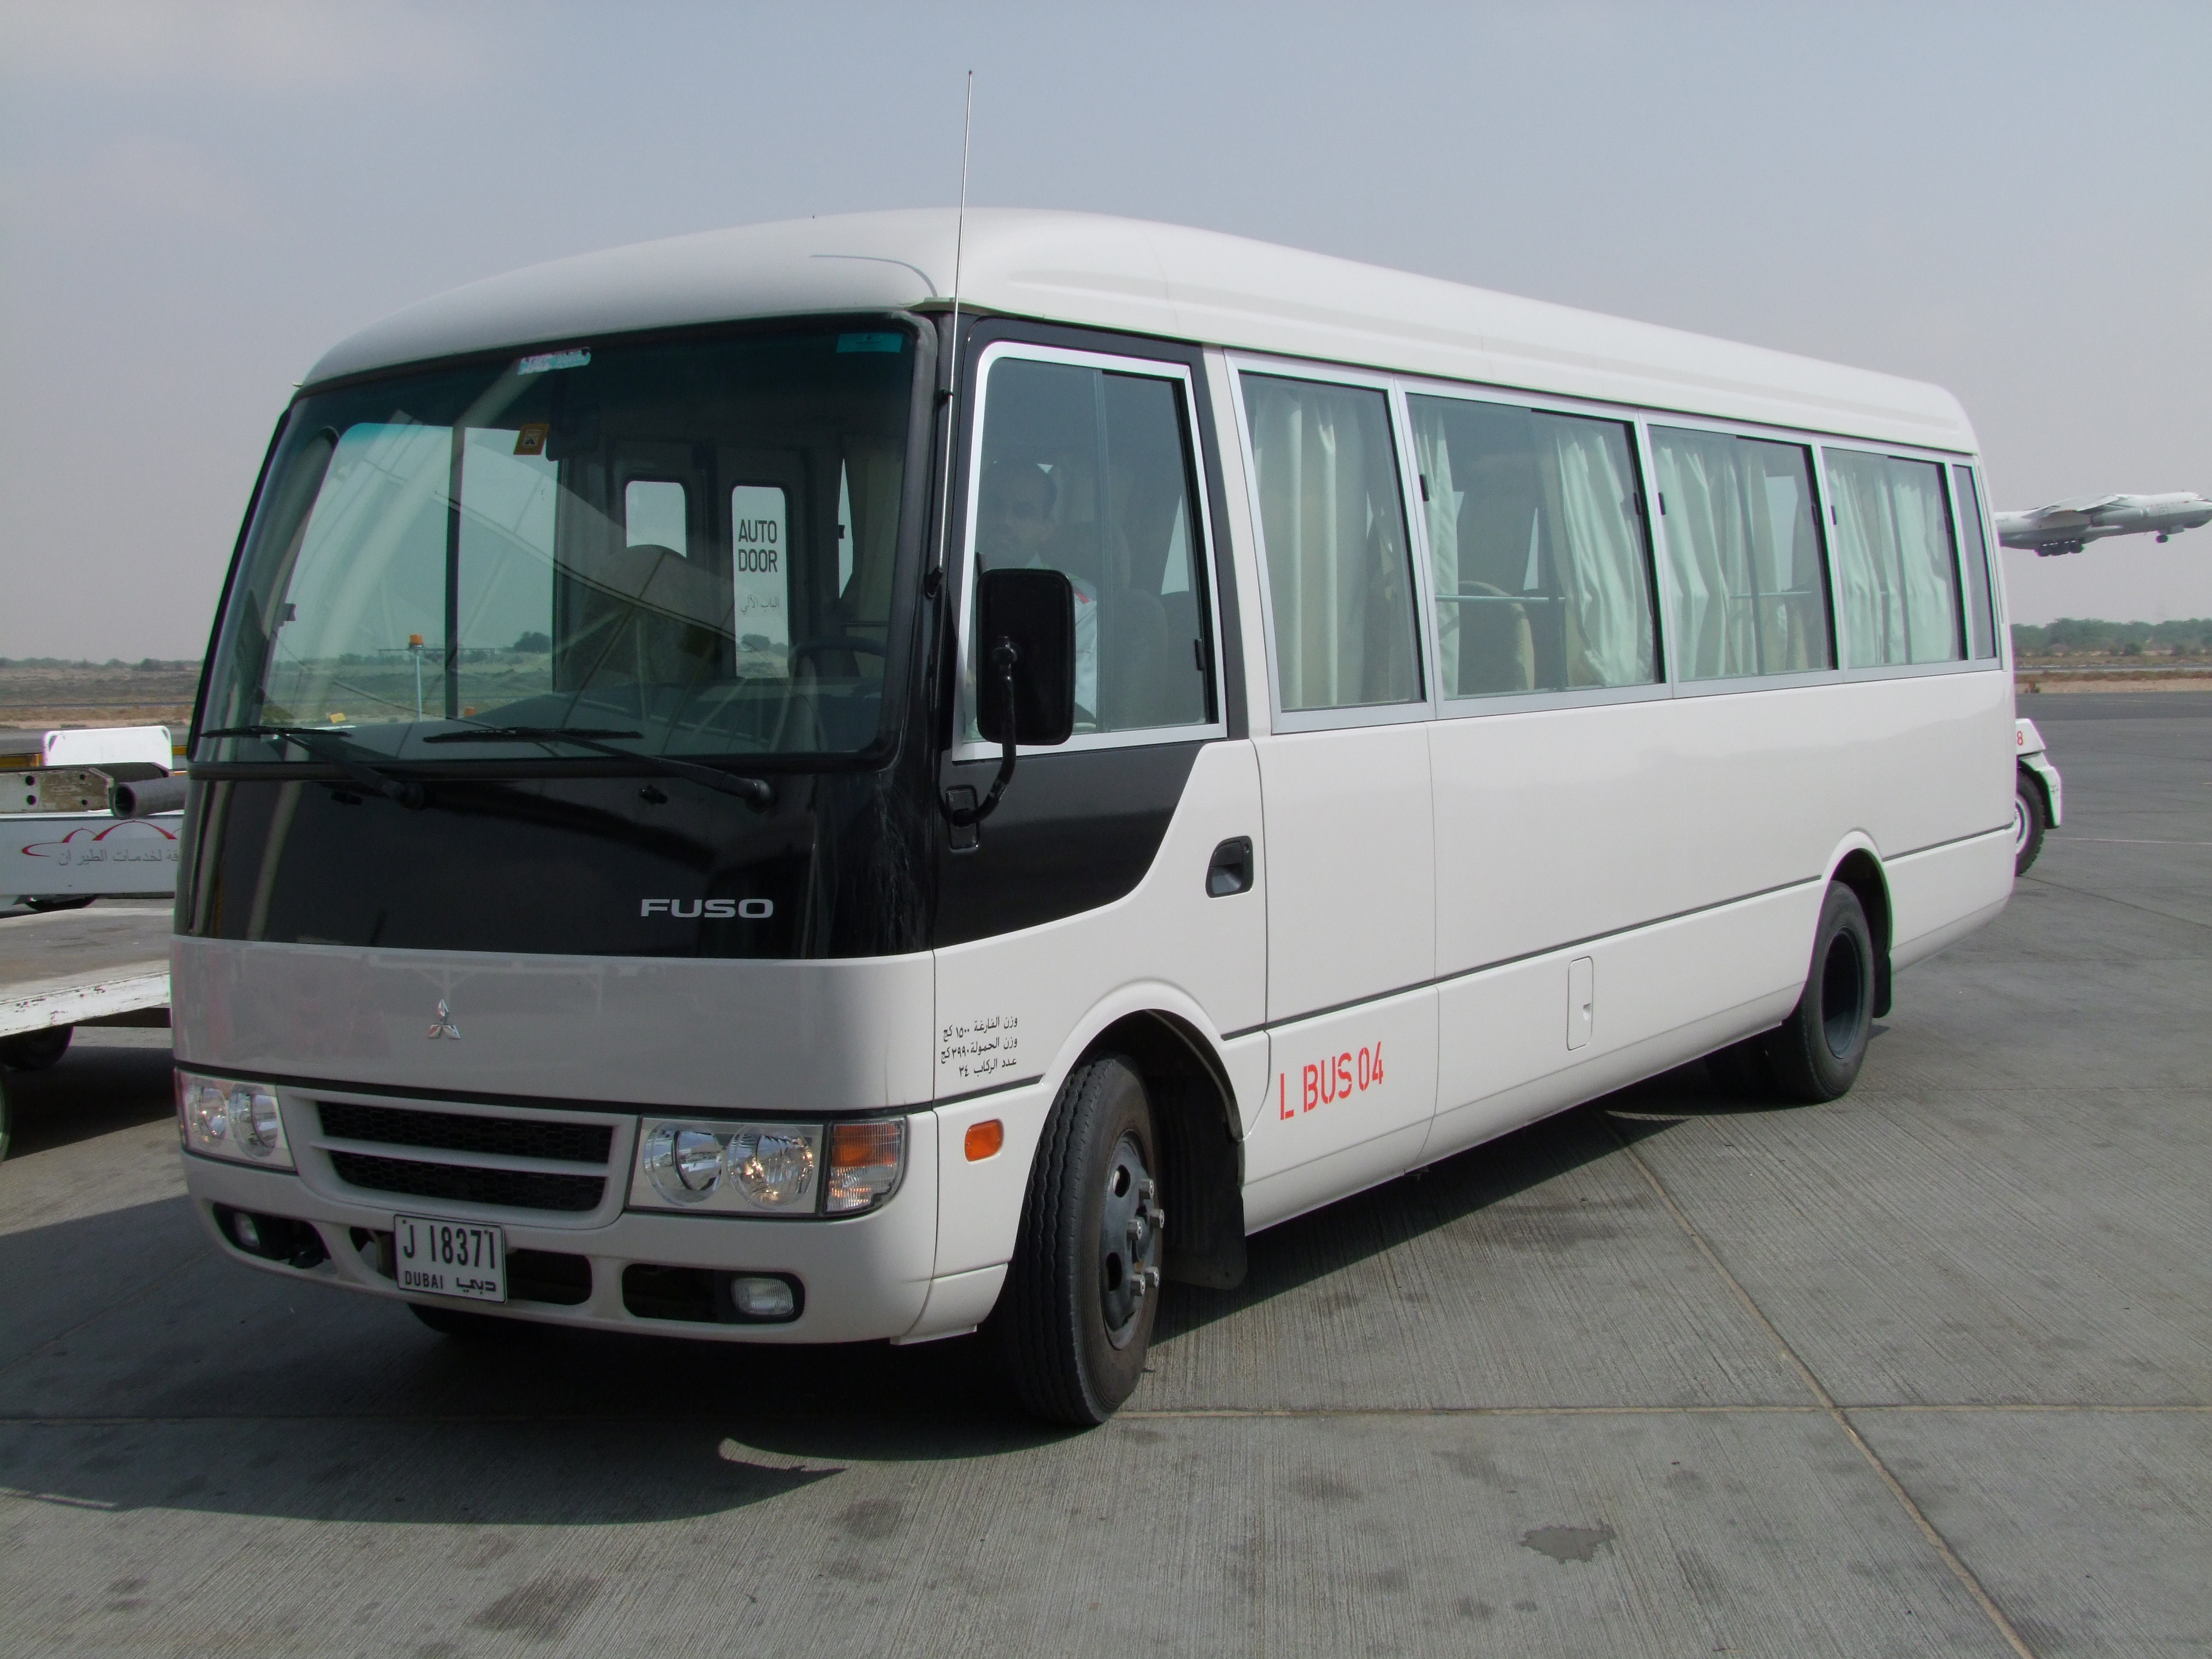 Ağ avtobus Mitsubishi Rosa